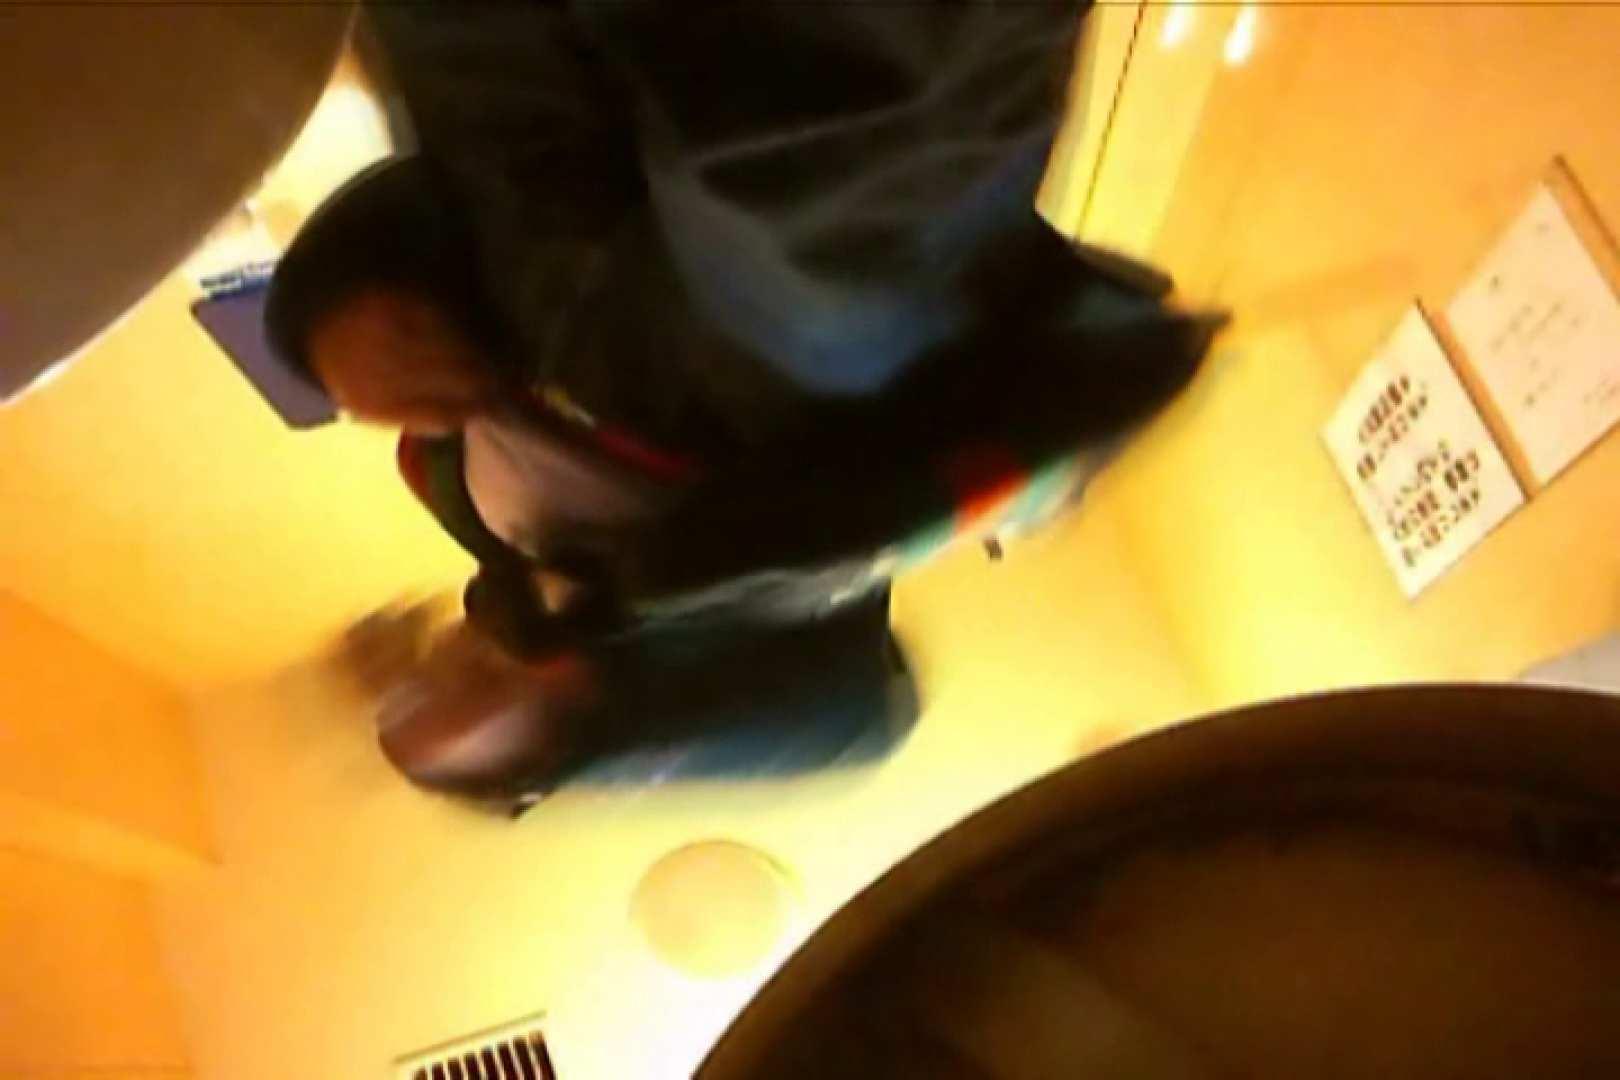 SEASON 2ND!掴み取りさんの洗面所覗き!in新幹線!VOL.13 リーマン系ボーイズ | 人気シリーズ  80pic 35